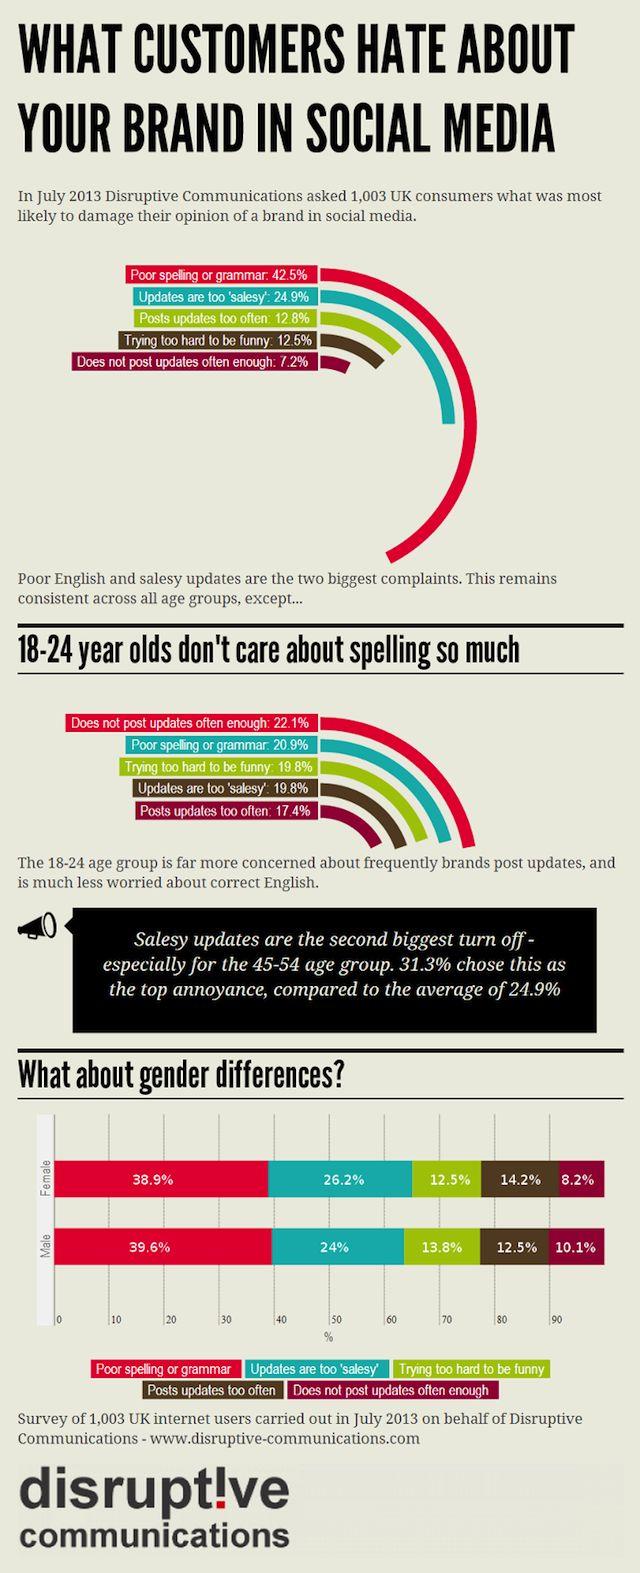 #infographic #socialmedia